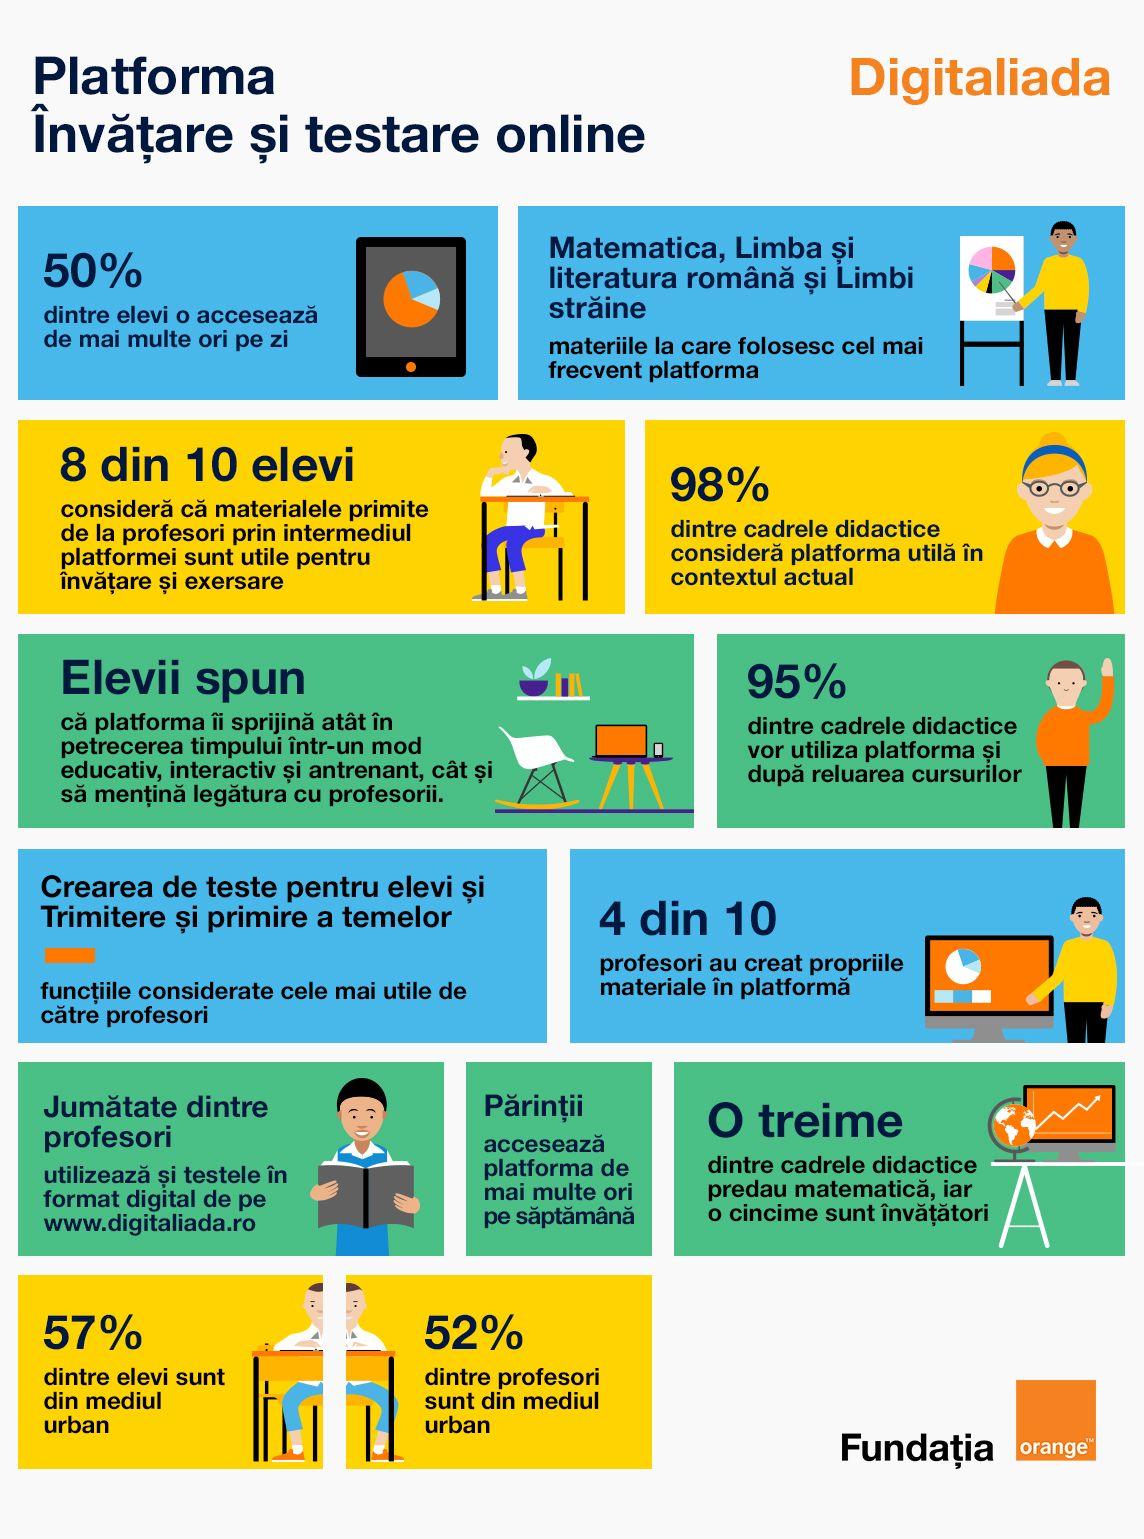 Studiu Digitaliada Ce resurse online folosescprofesorii